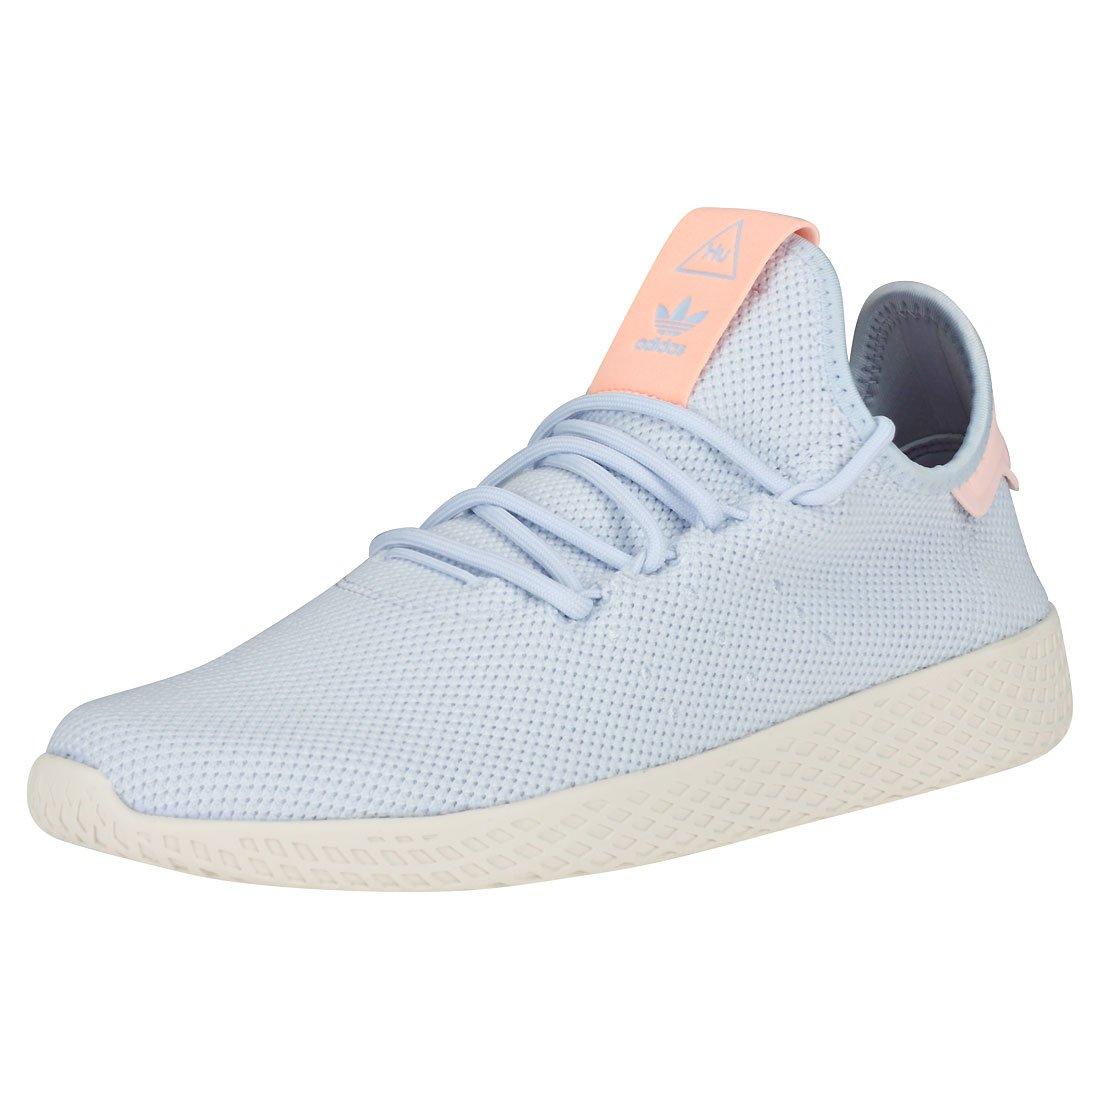 Adidas Damen PW Tennis Hu Blau W Fitnessschuhe, Grau, EU Blau Hu (Aeroaz/Aeroaz/Blatiz 000) 04dede